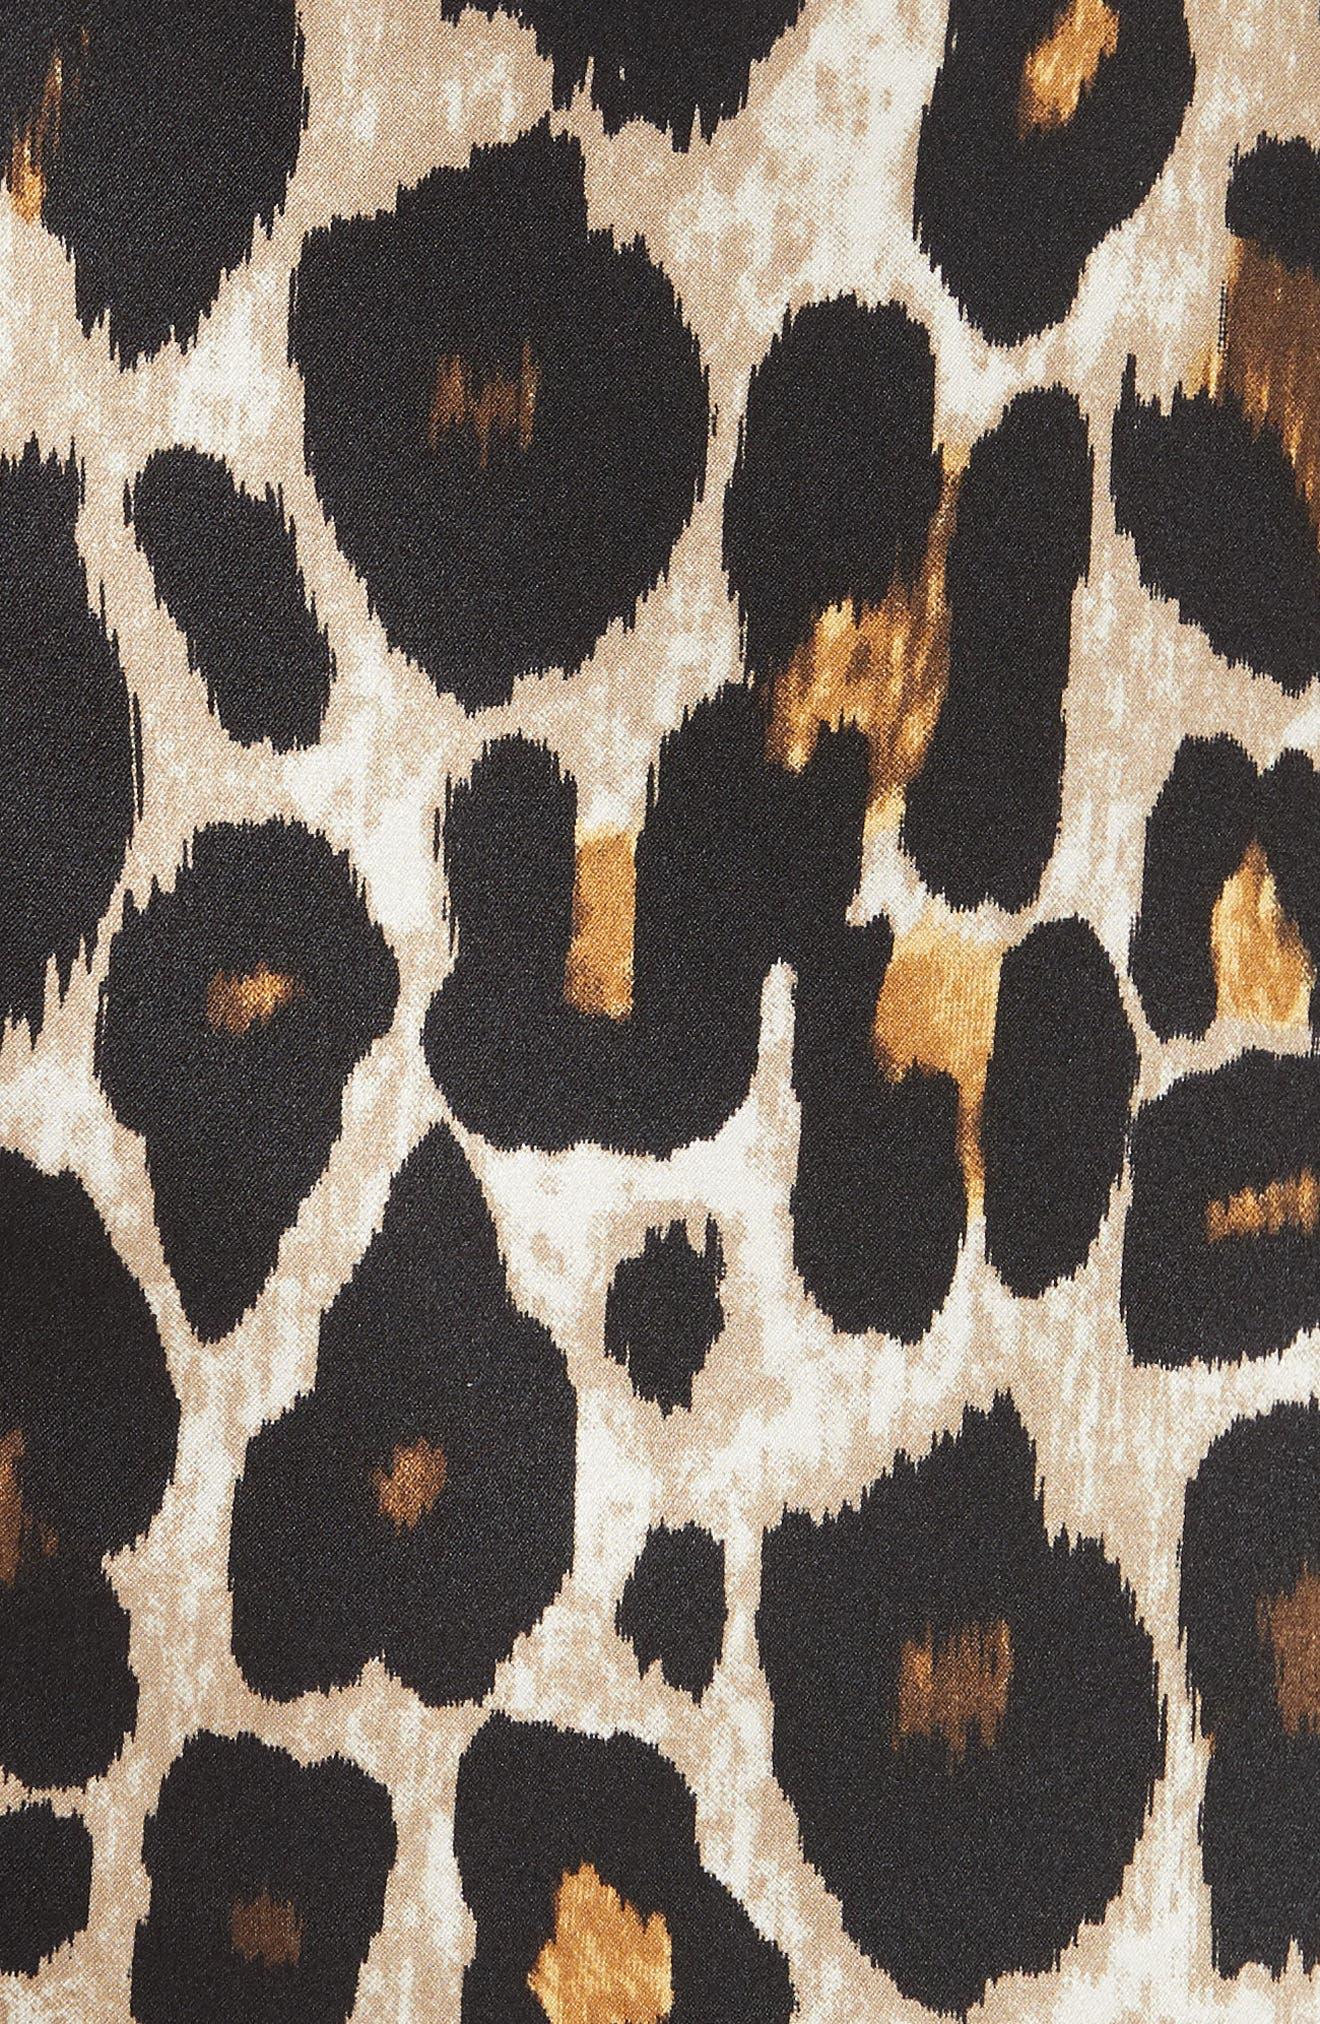 Leopard Print Tank Top,                             Alternate thumbnail 5, color,                             200